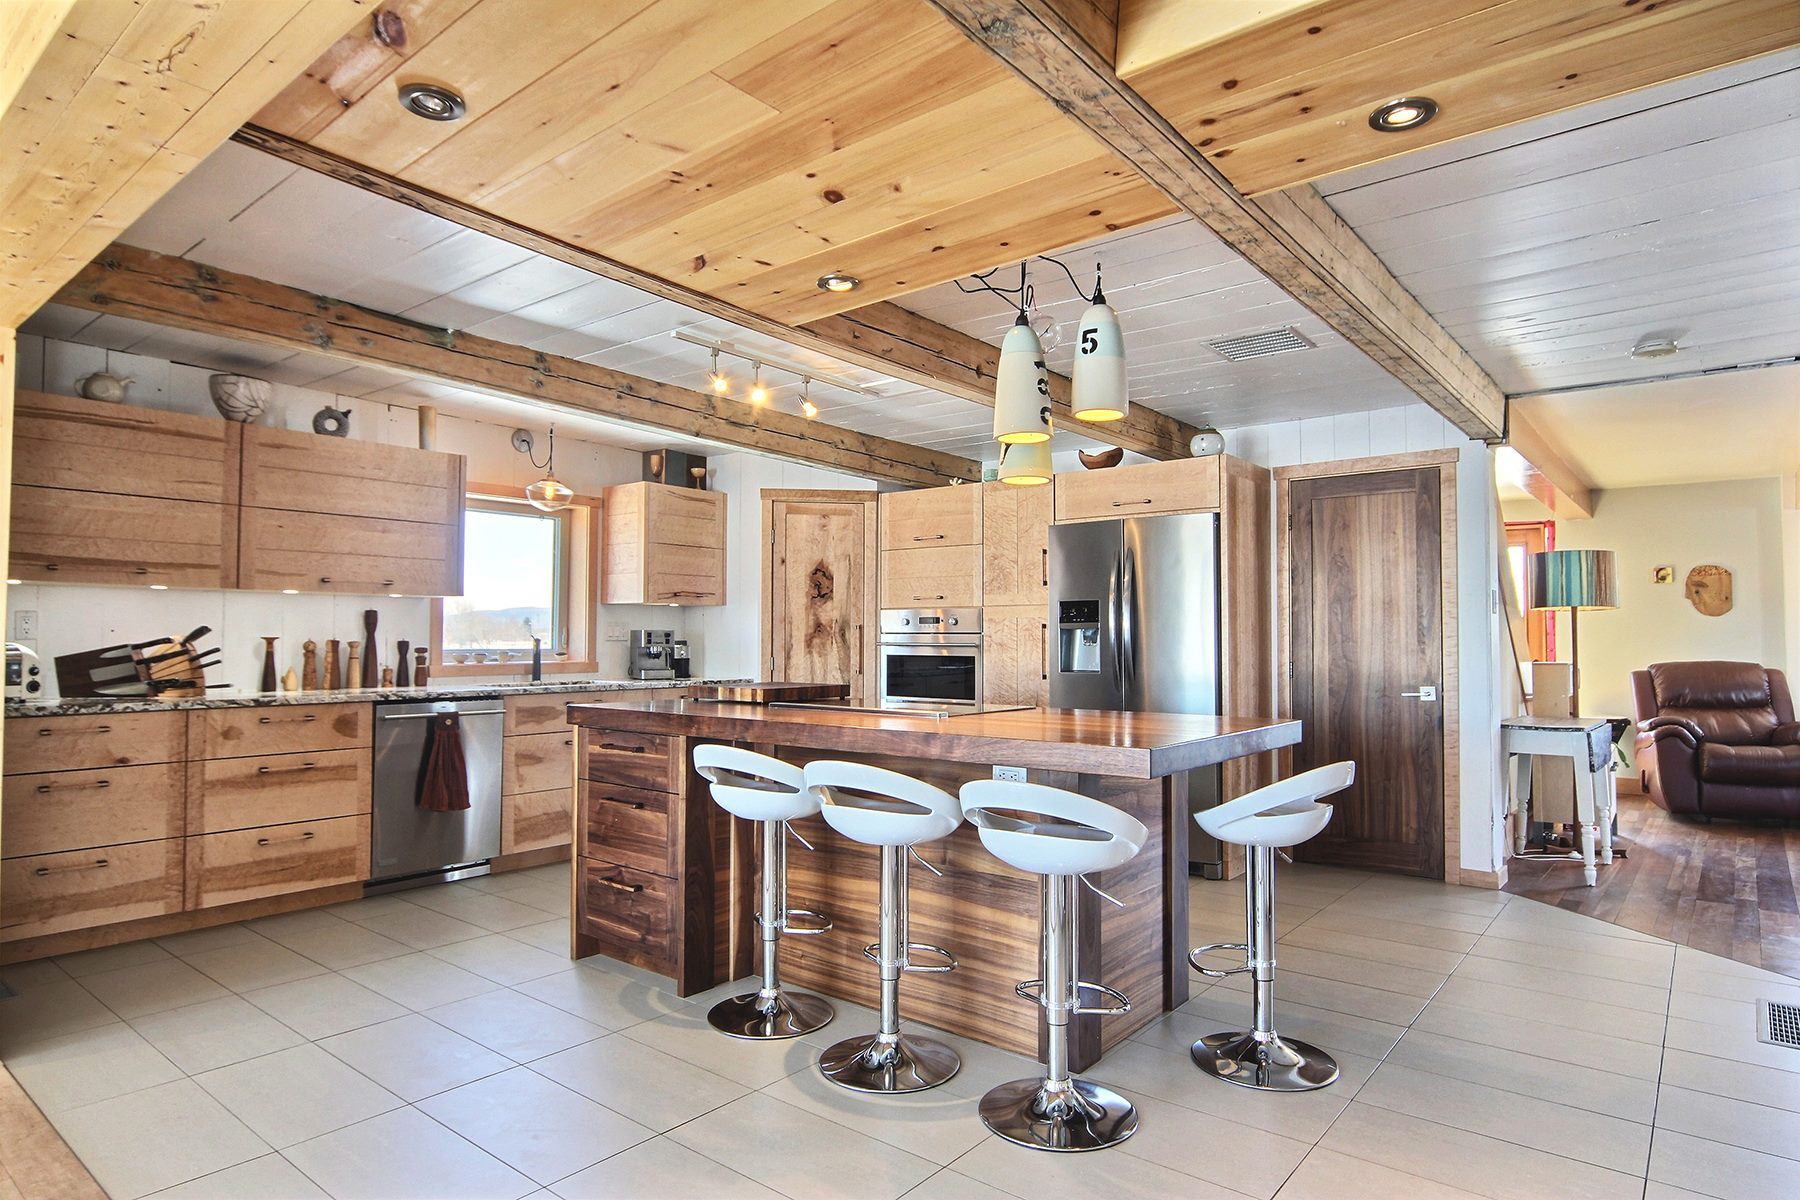 Cuisine & Salle à manger | Kitchen & Dining room